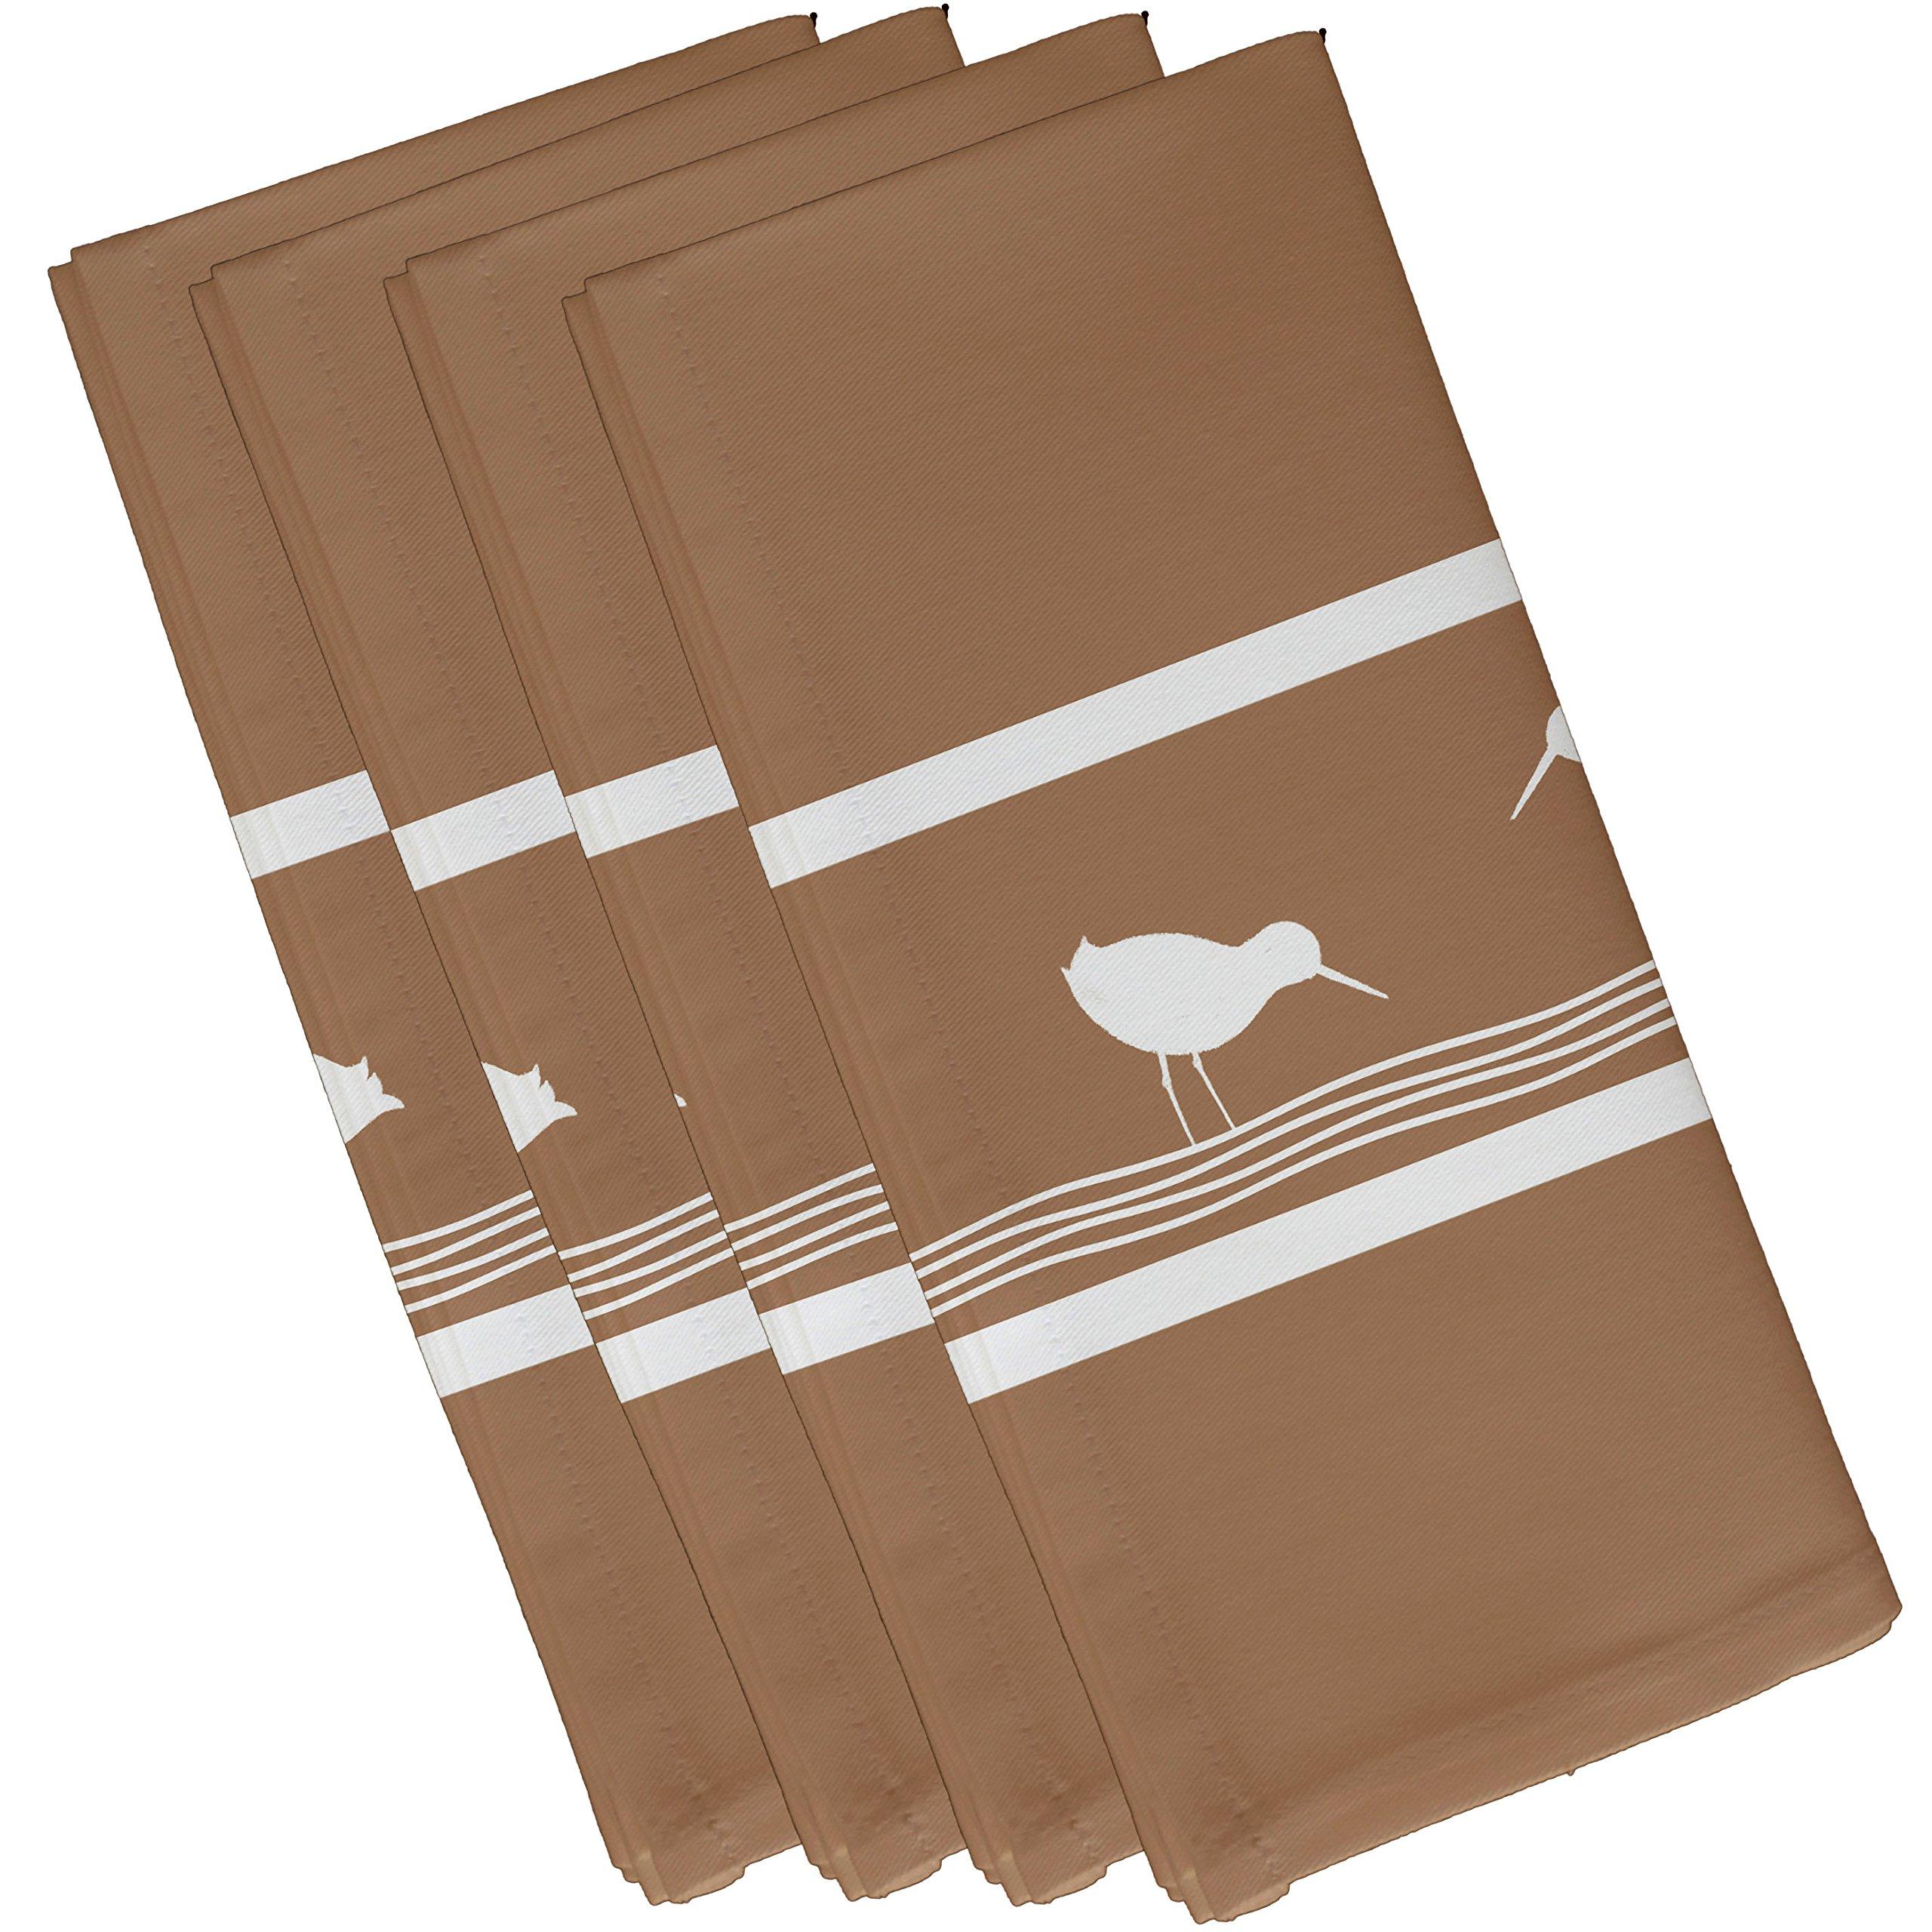 E by design Birdwalk, Animal Print Napkin, 19 x 19'', Taupe/Beige